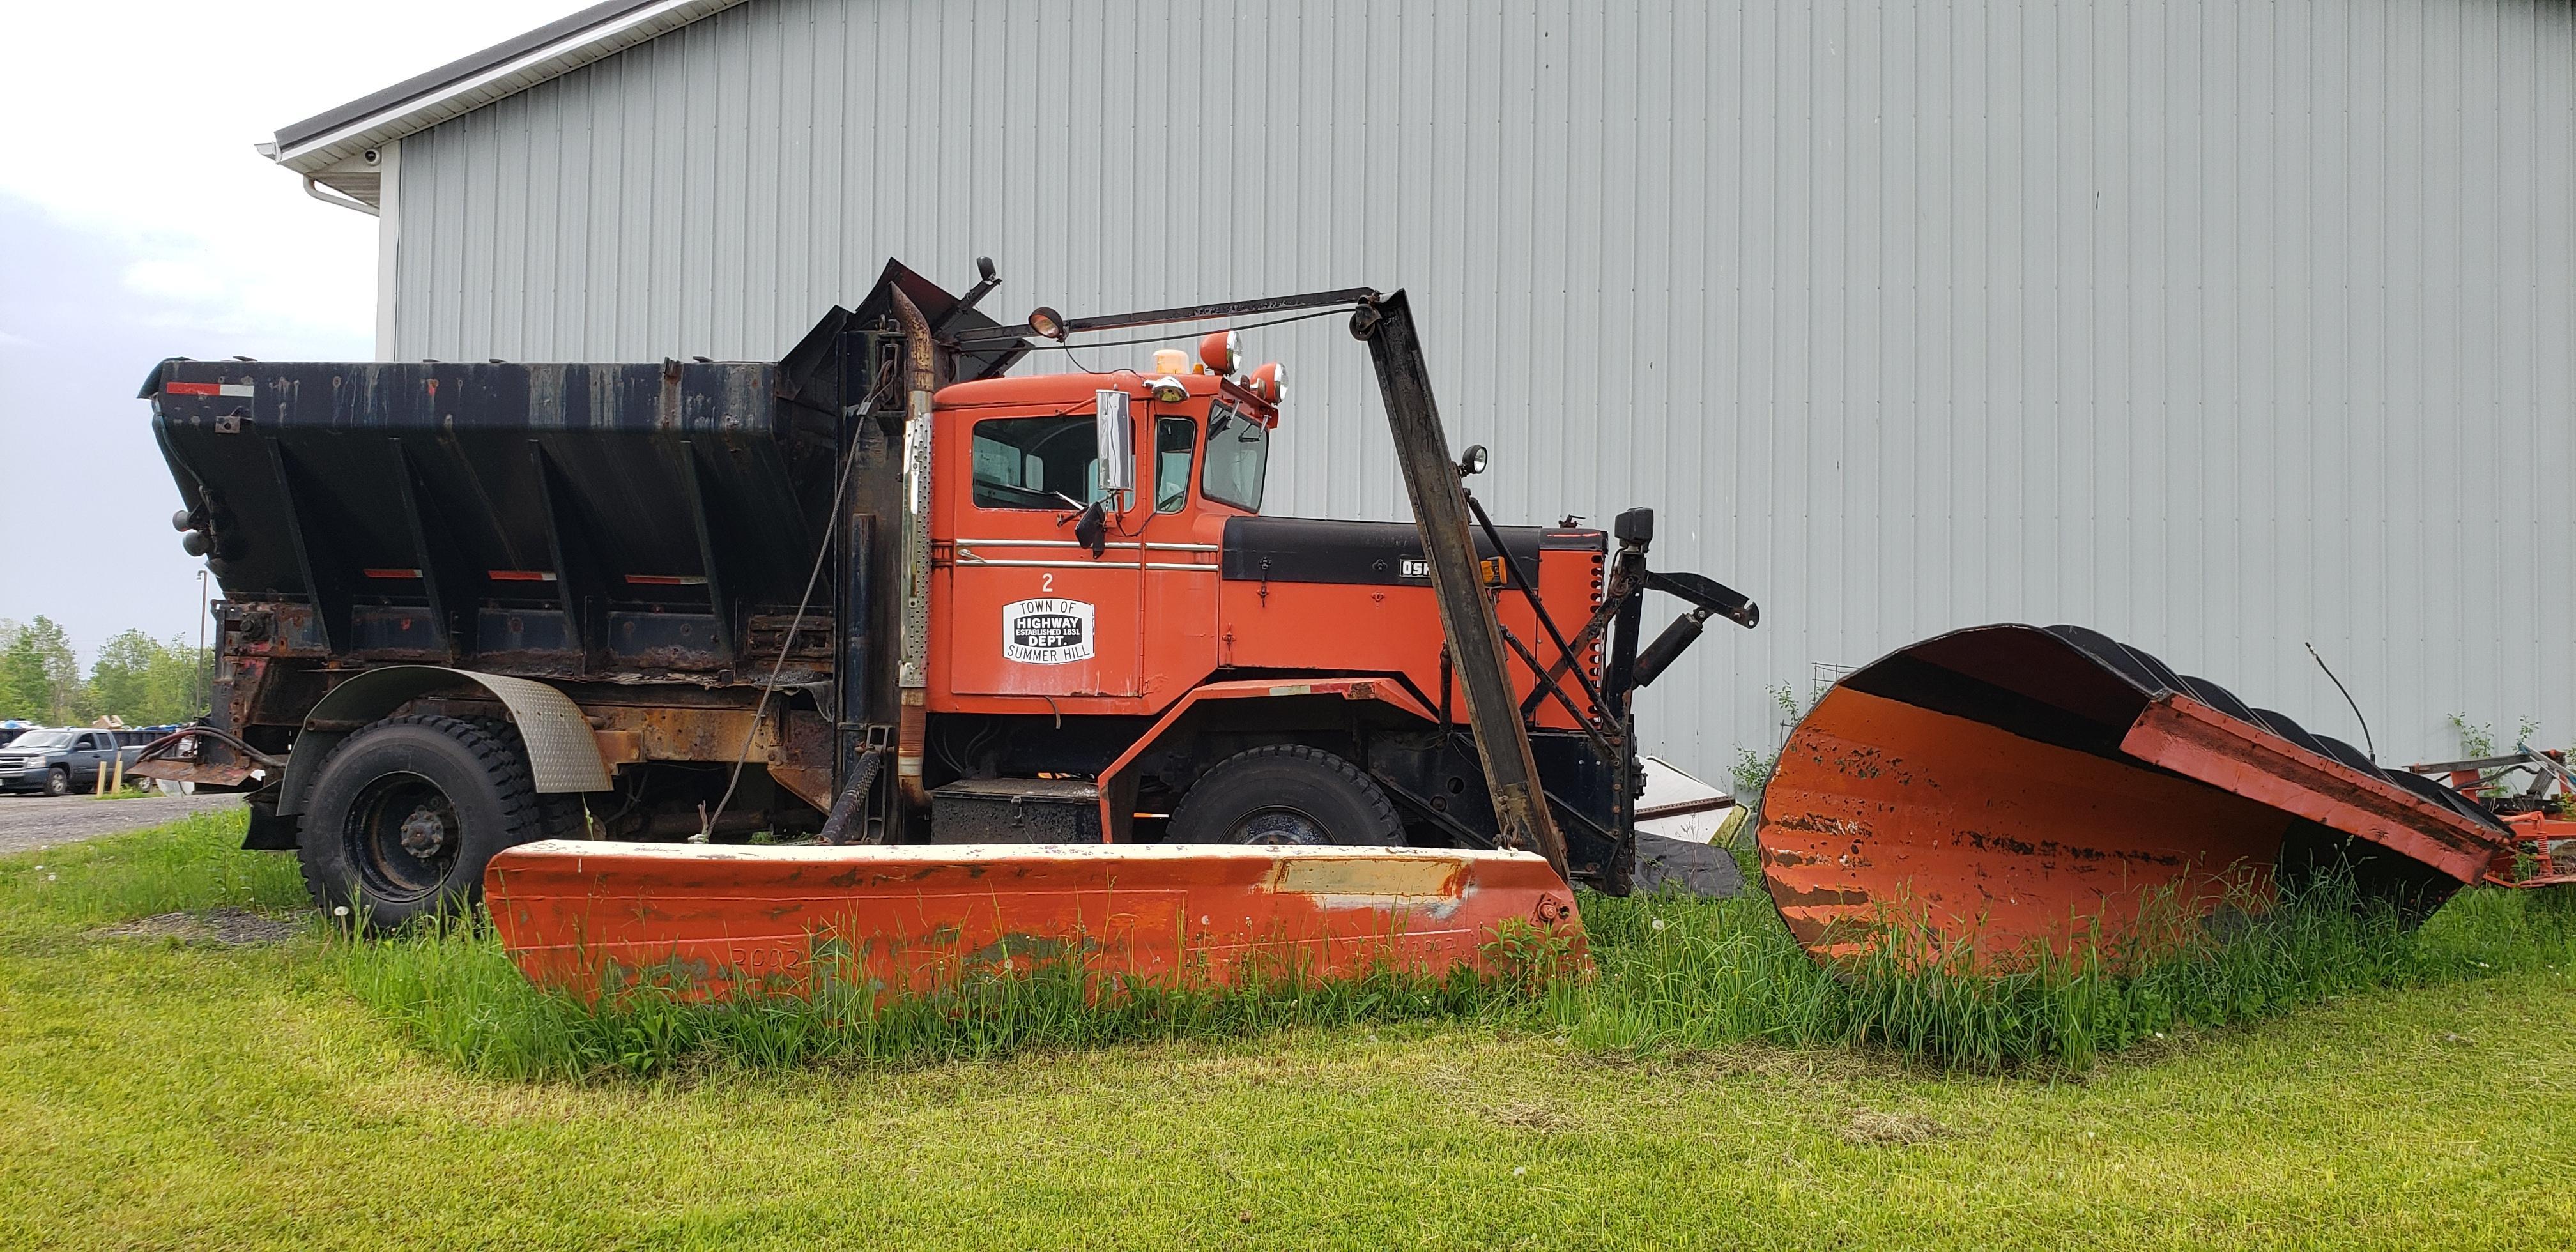 Oshkosh Snow Plow Wip Model Trucks Big Rigs And Heavy Equipment Model Cars Magazine Forum